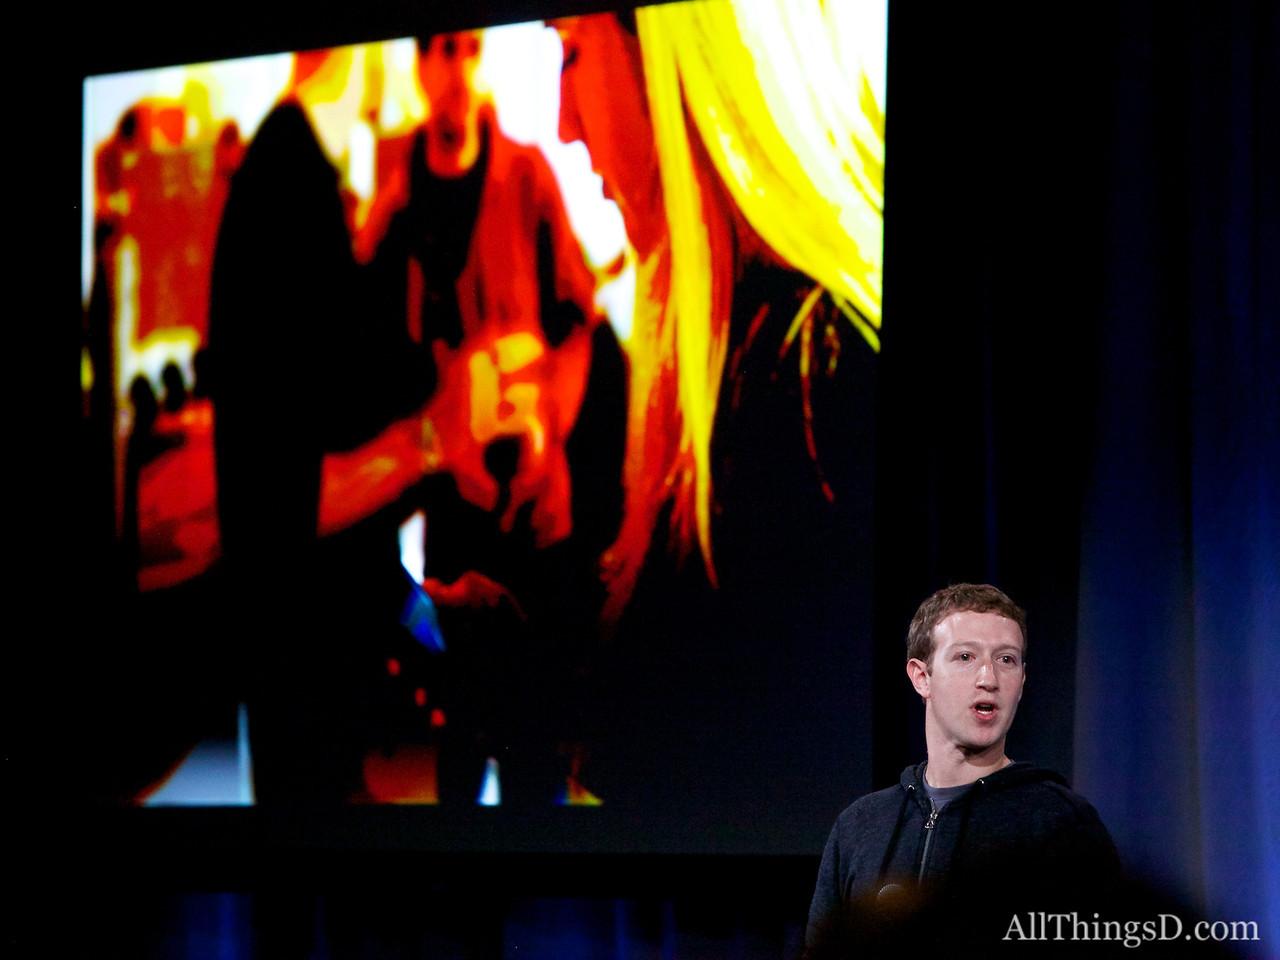 Facebook CEO Mark Zuckerberg at the Facebook Home launch event.